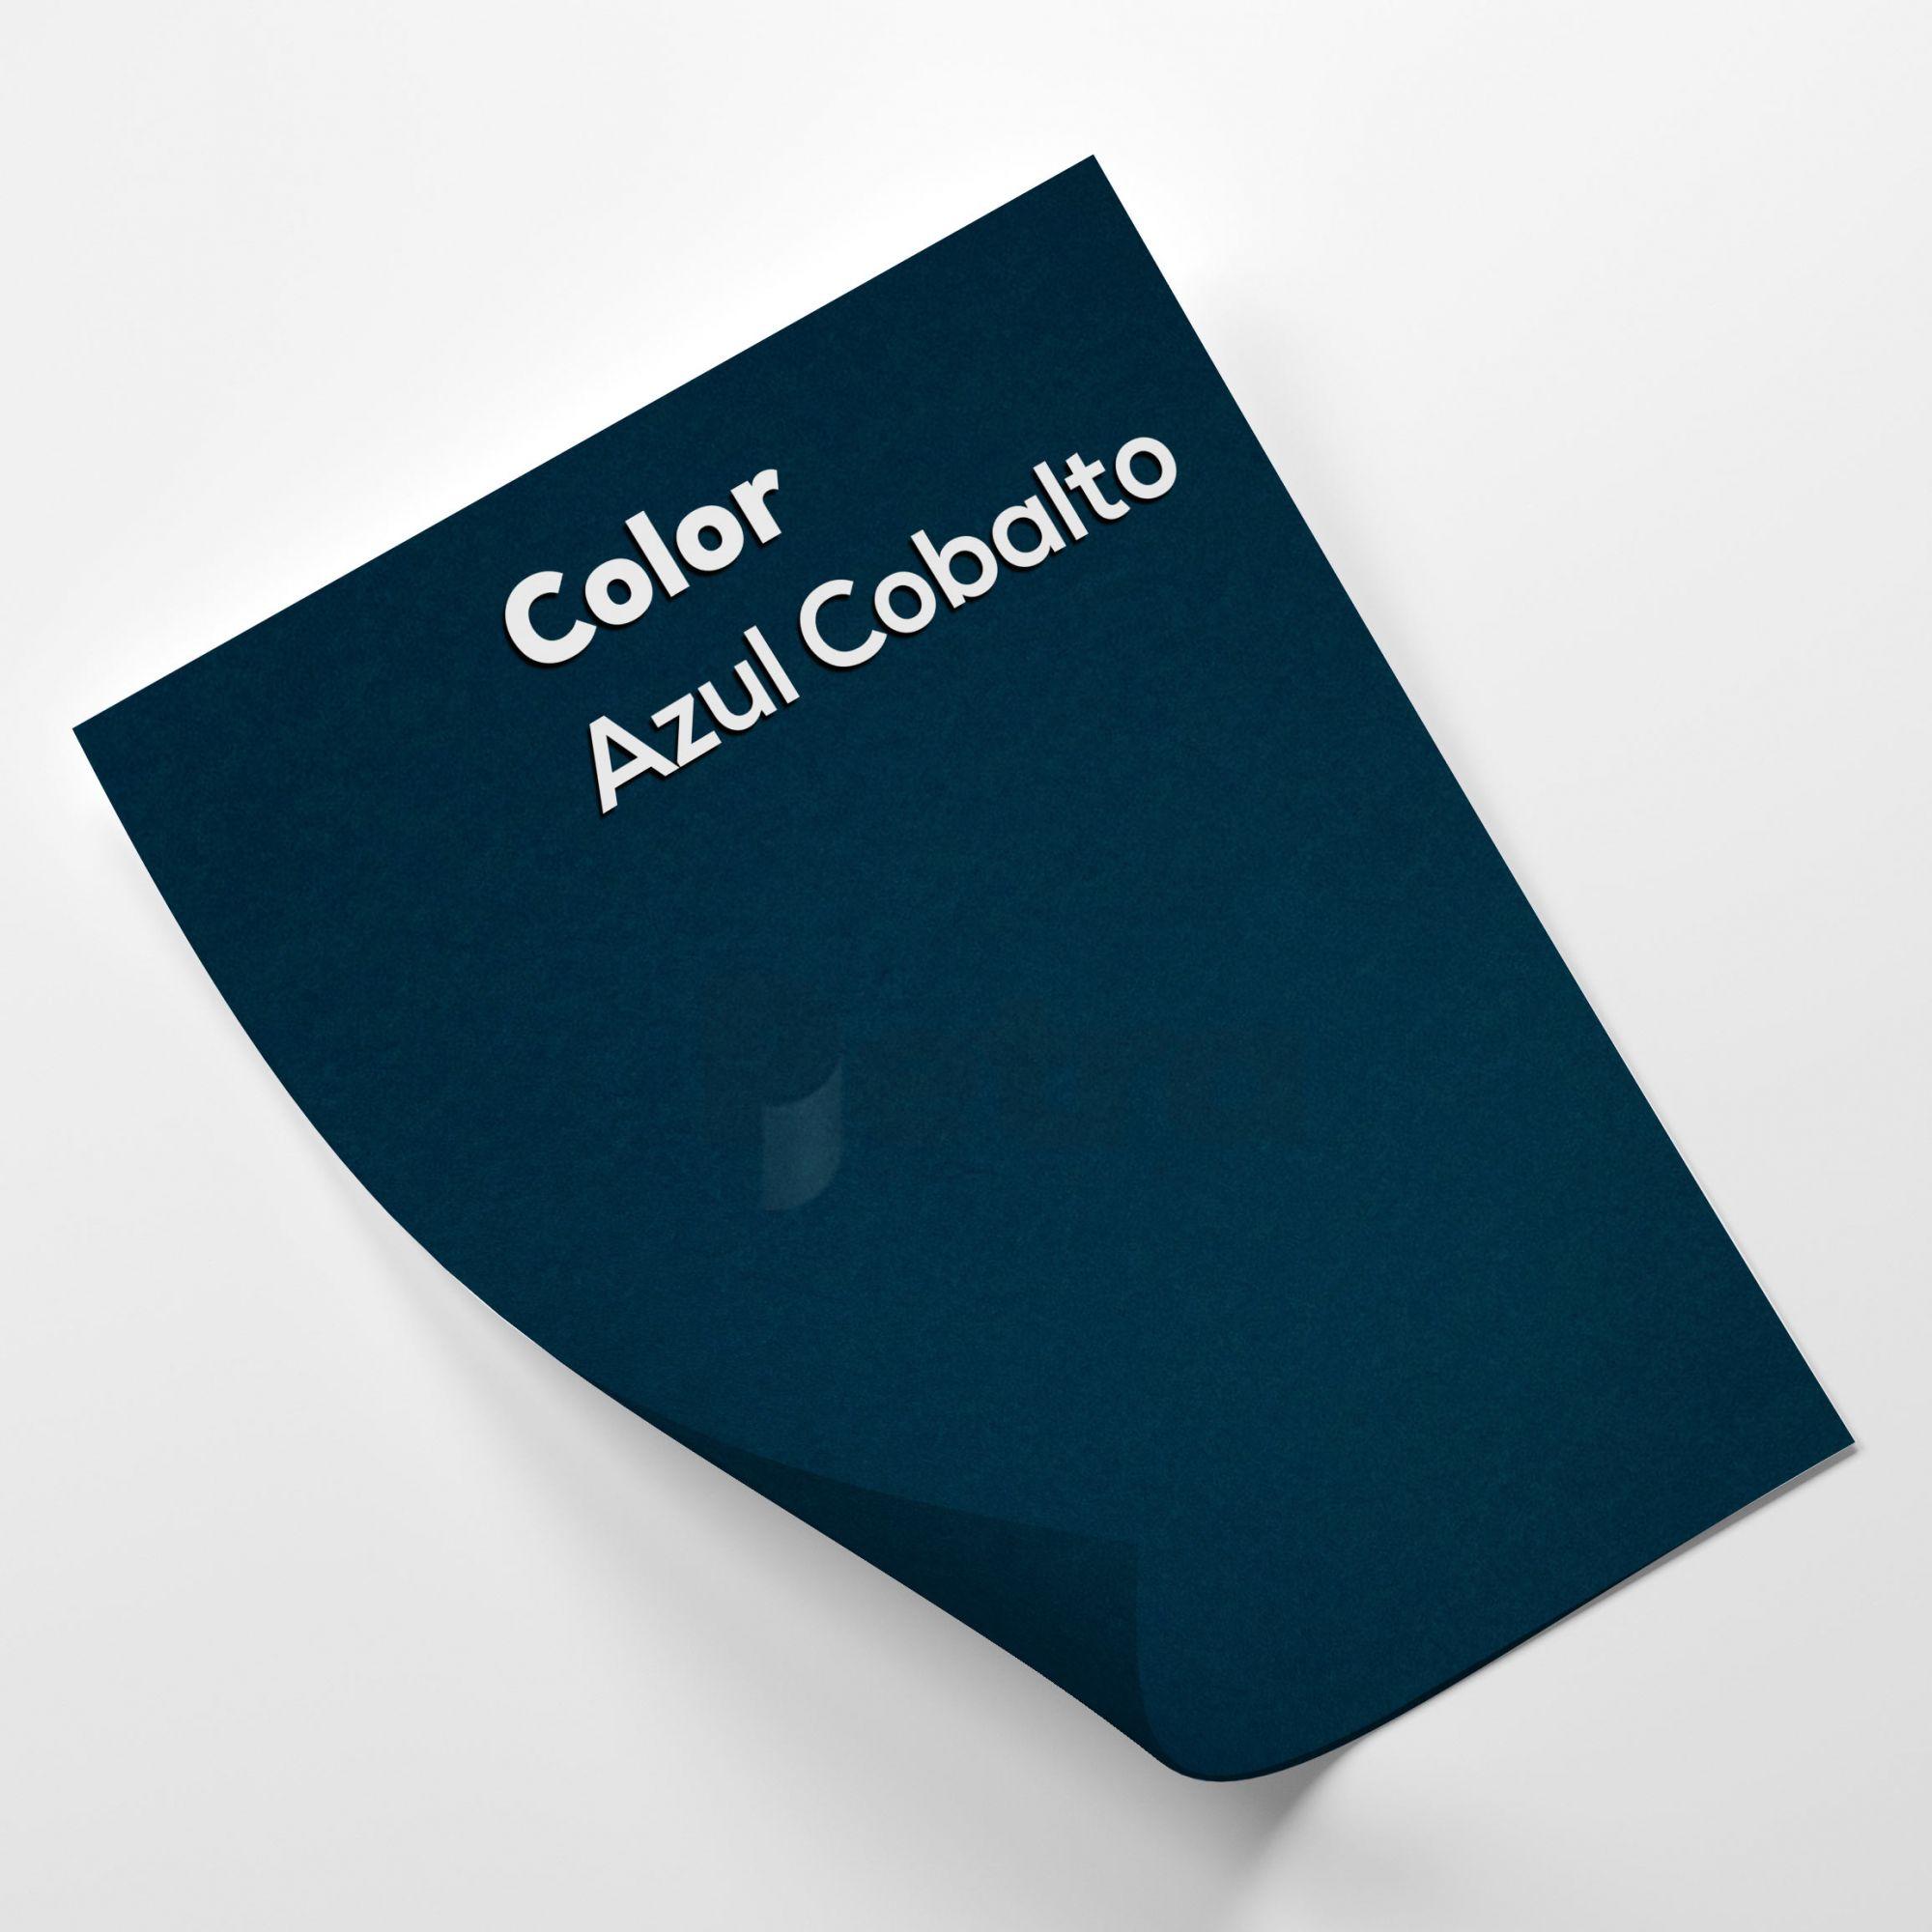 Papel Colorido  Azul Cobalto - tam. A4 180g/m²